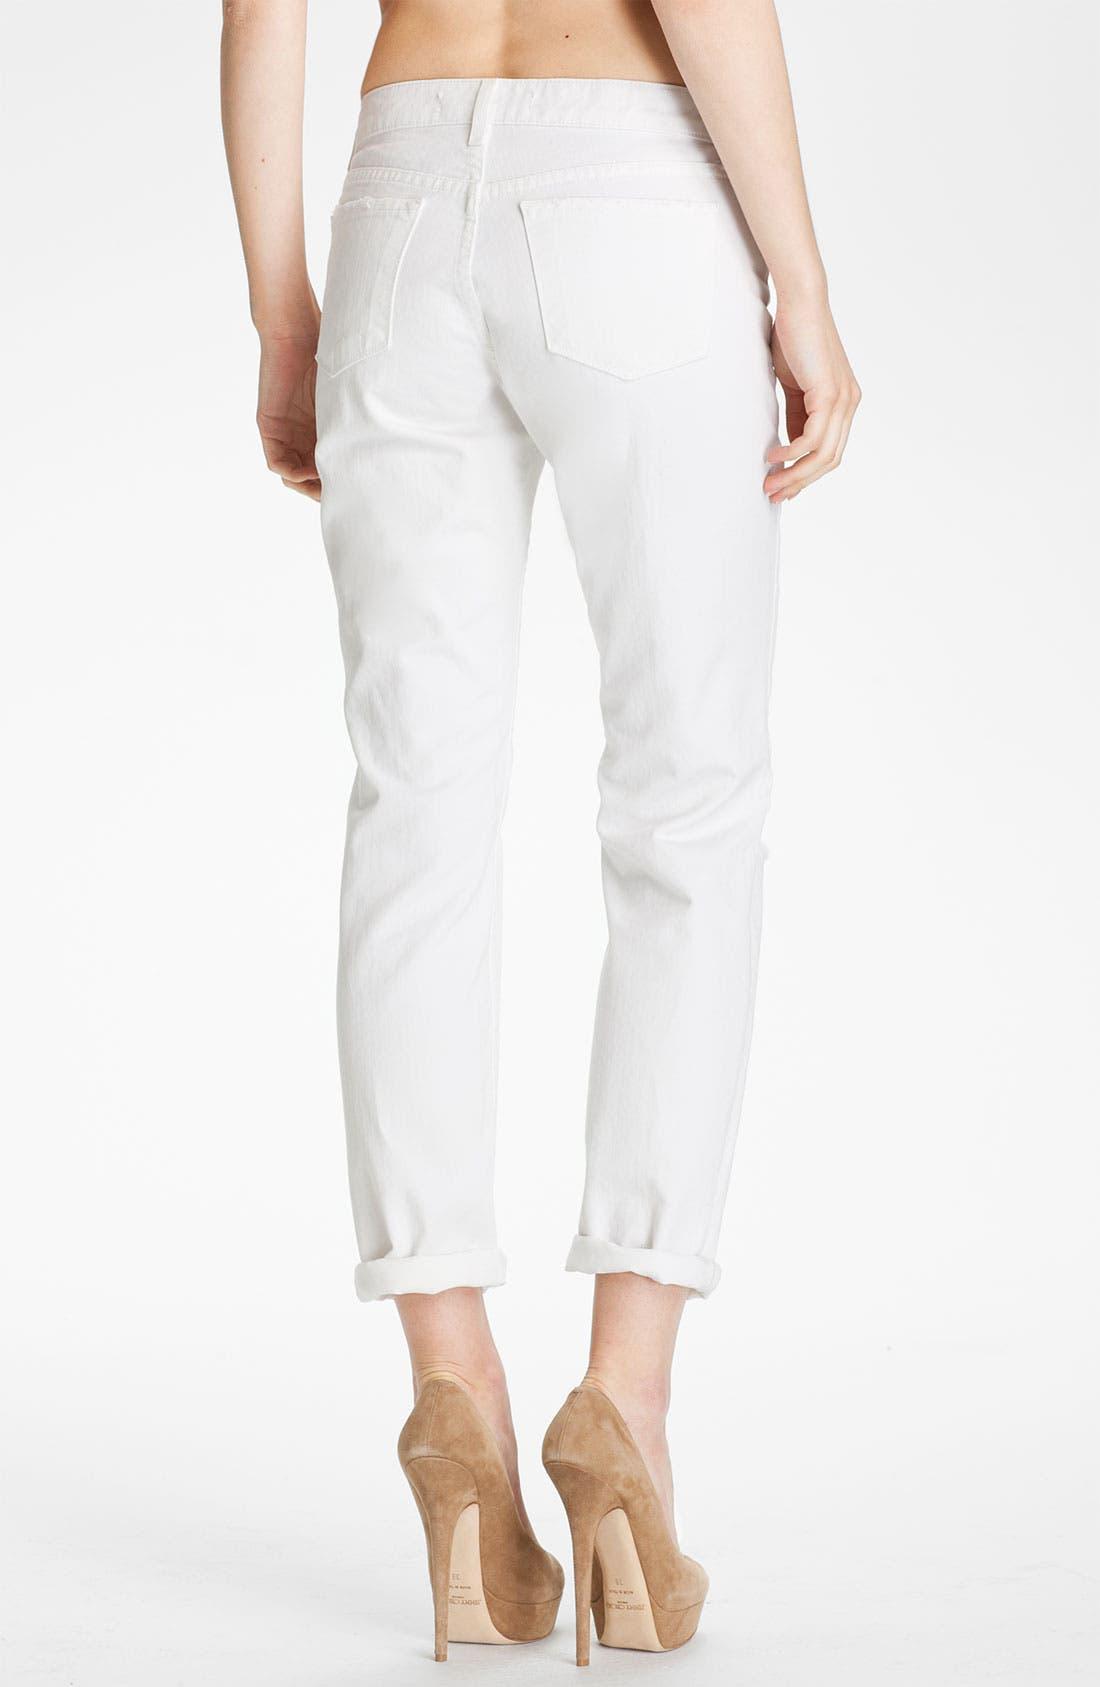 Alternate Image 2  - J Brand 'Aidan' Distressed Boyfriend Fit Jeans (White Destructed)